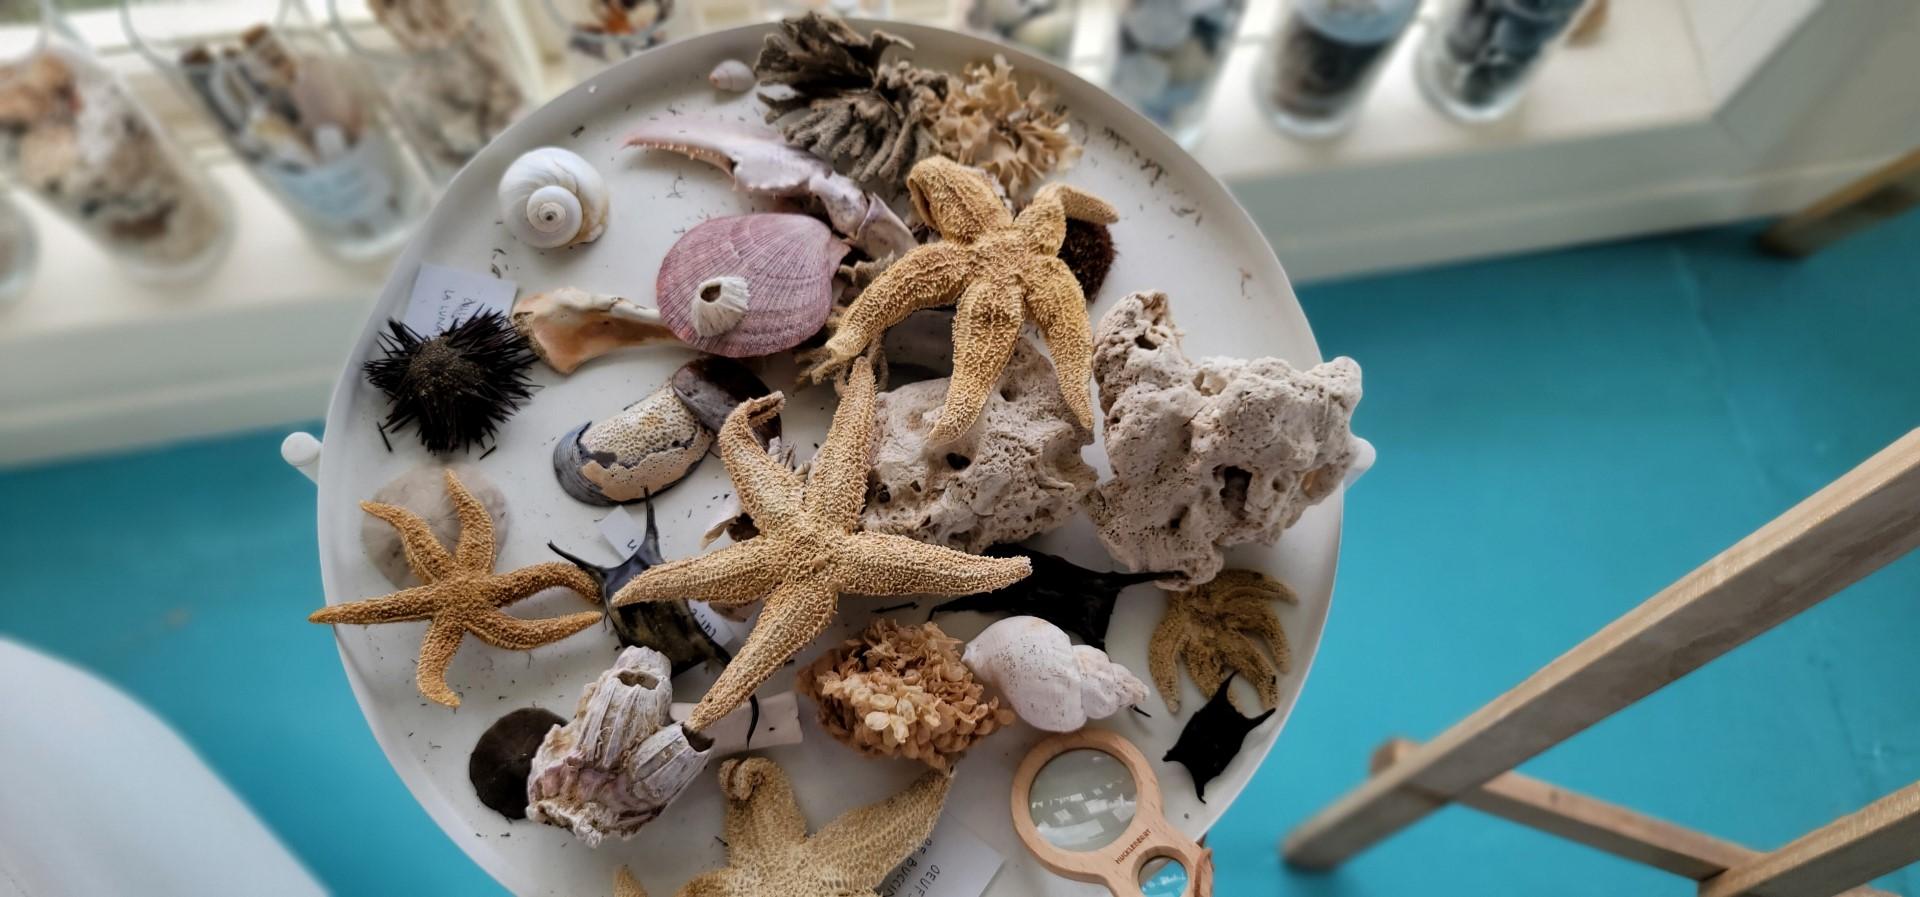 Shopping on Magdalen islands for shells on a platter